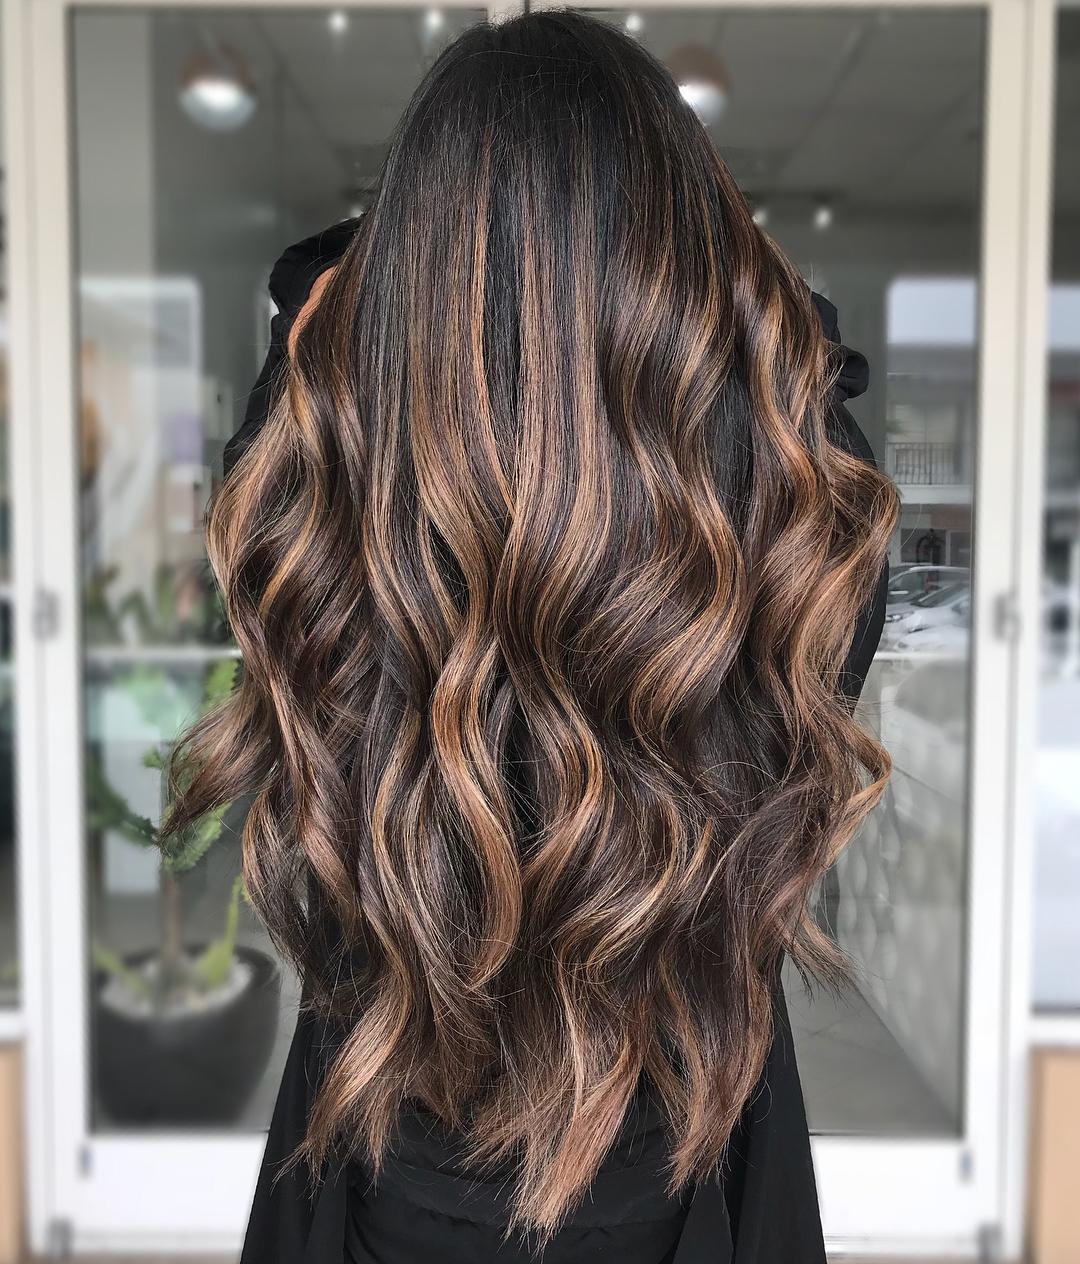 Long Chocolate Hair with Caramel Highlights